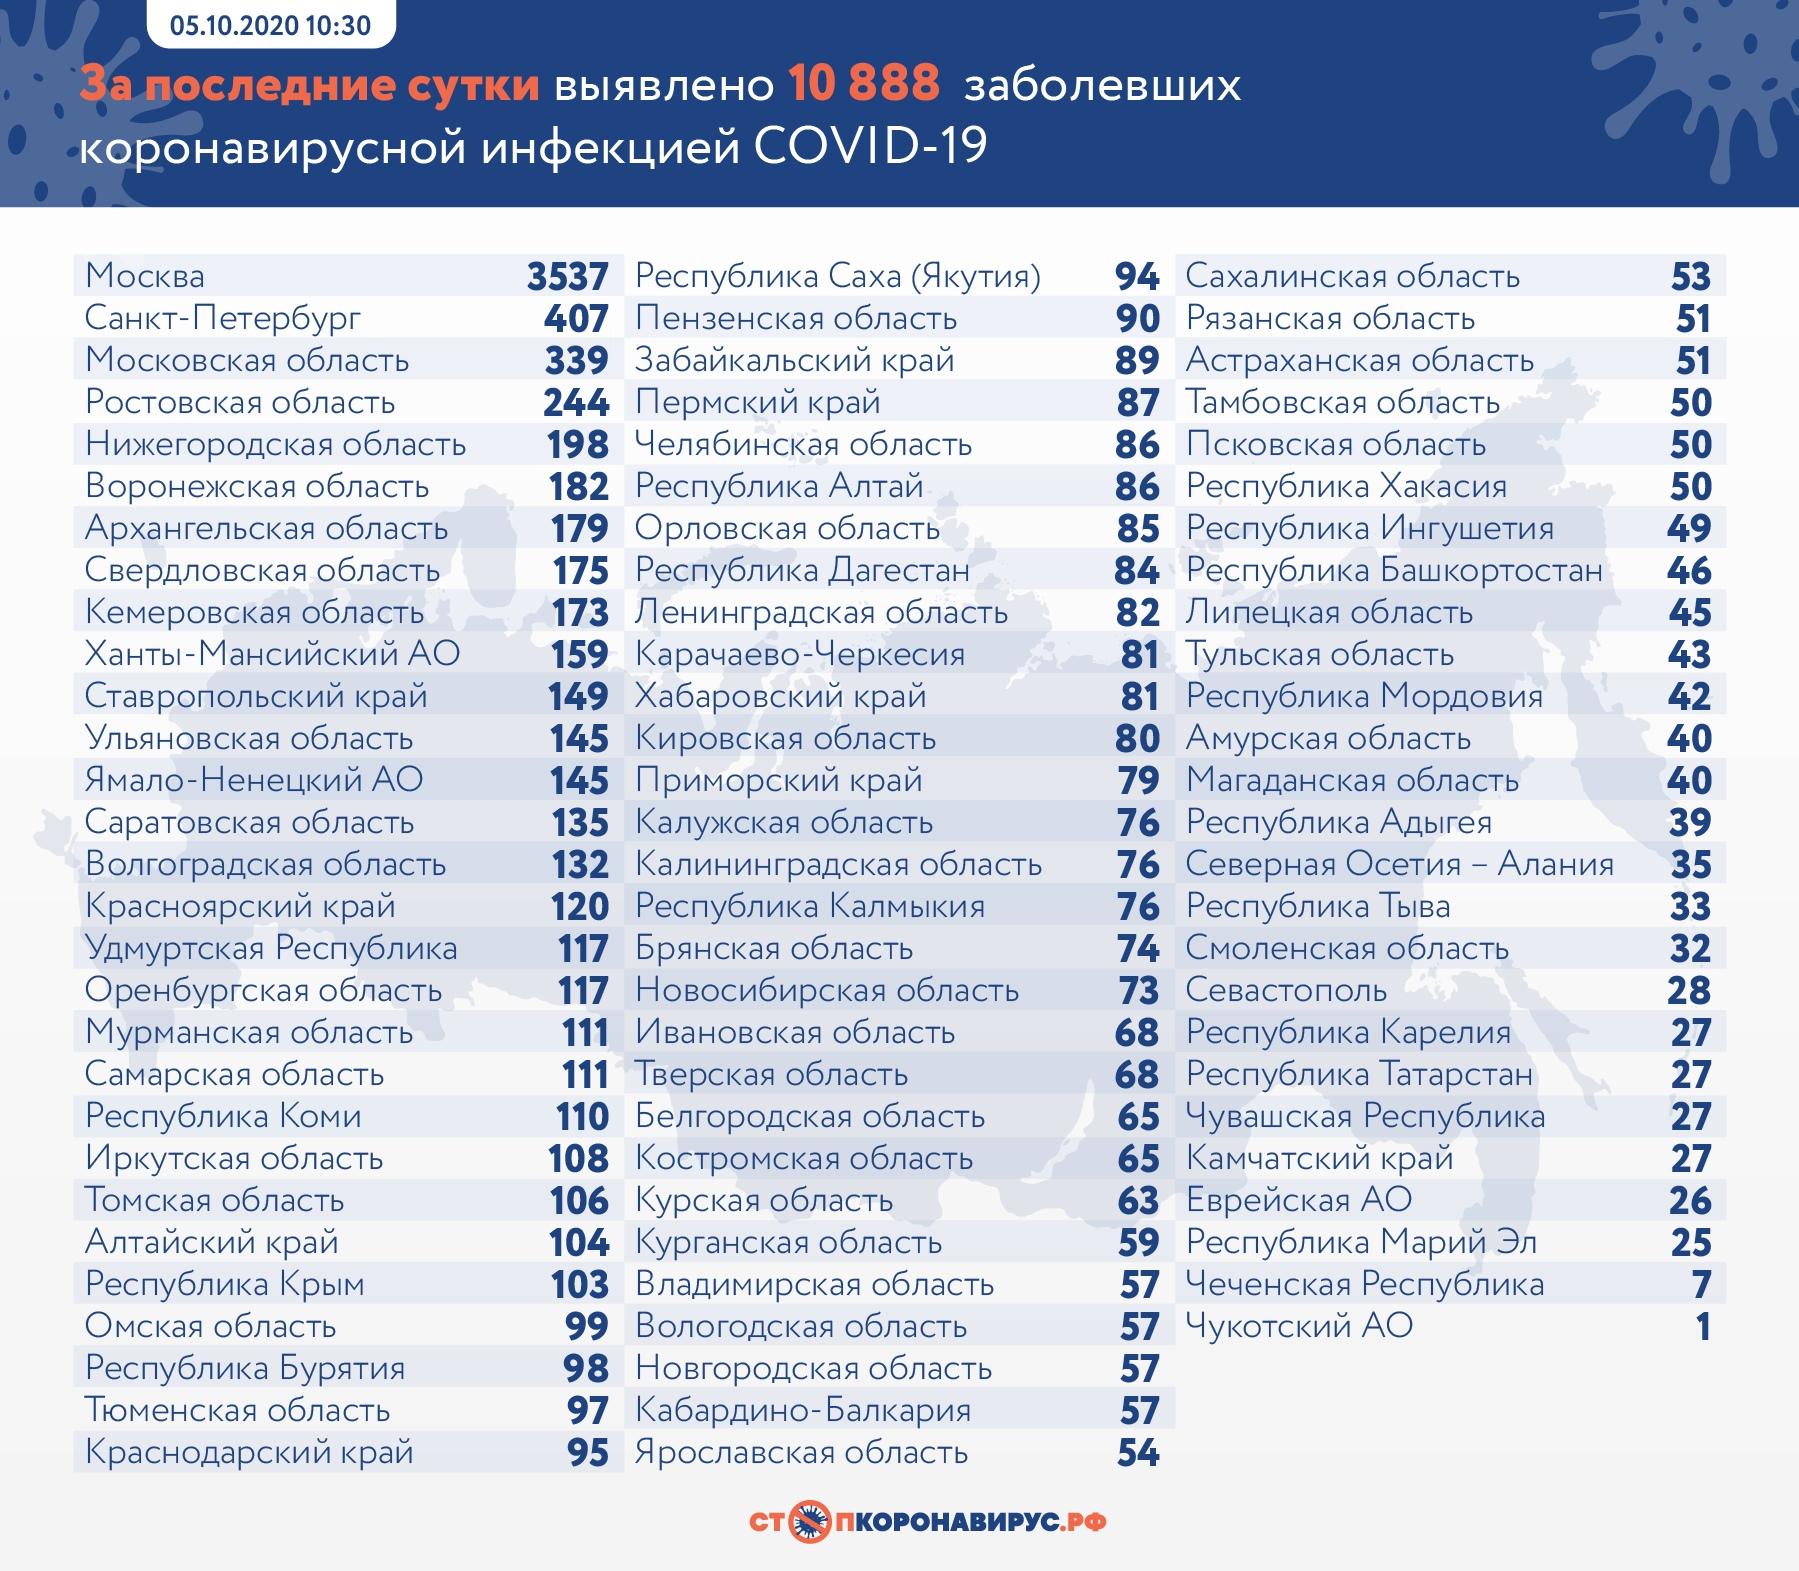 111 человек заразились COVID-19 в Самарской области за сутки